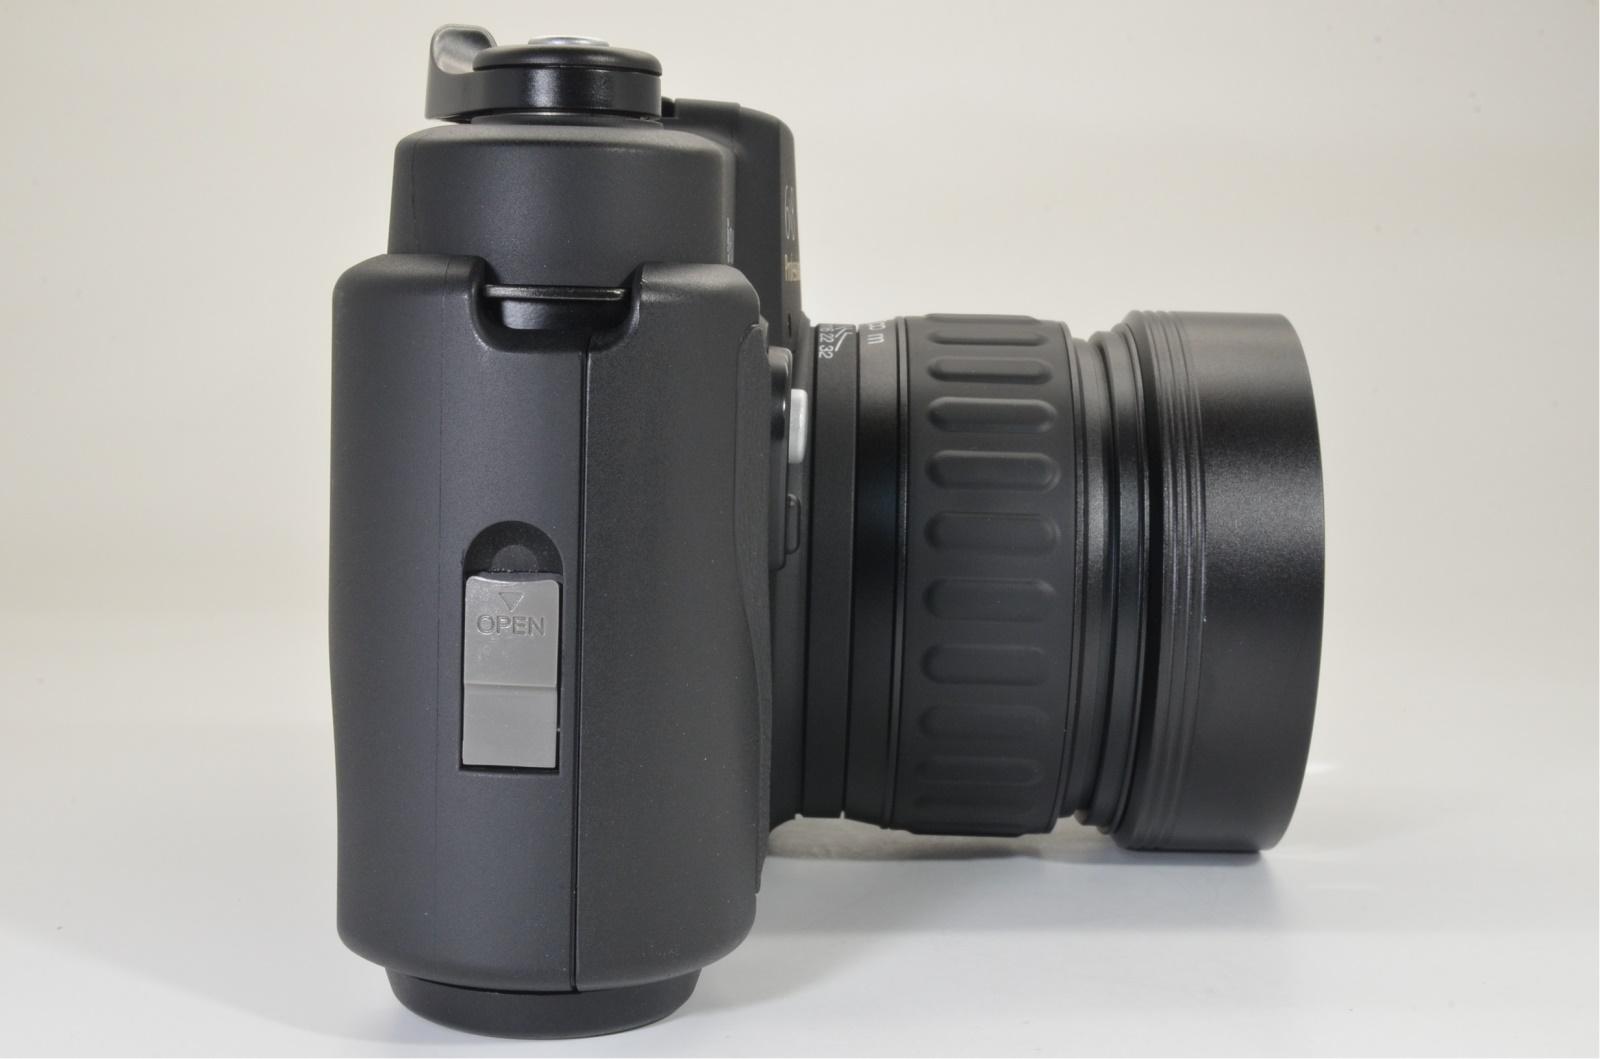 fuji fujifilm gw680iii 90mm f3.5 count 142 medium format camera shooting tested